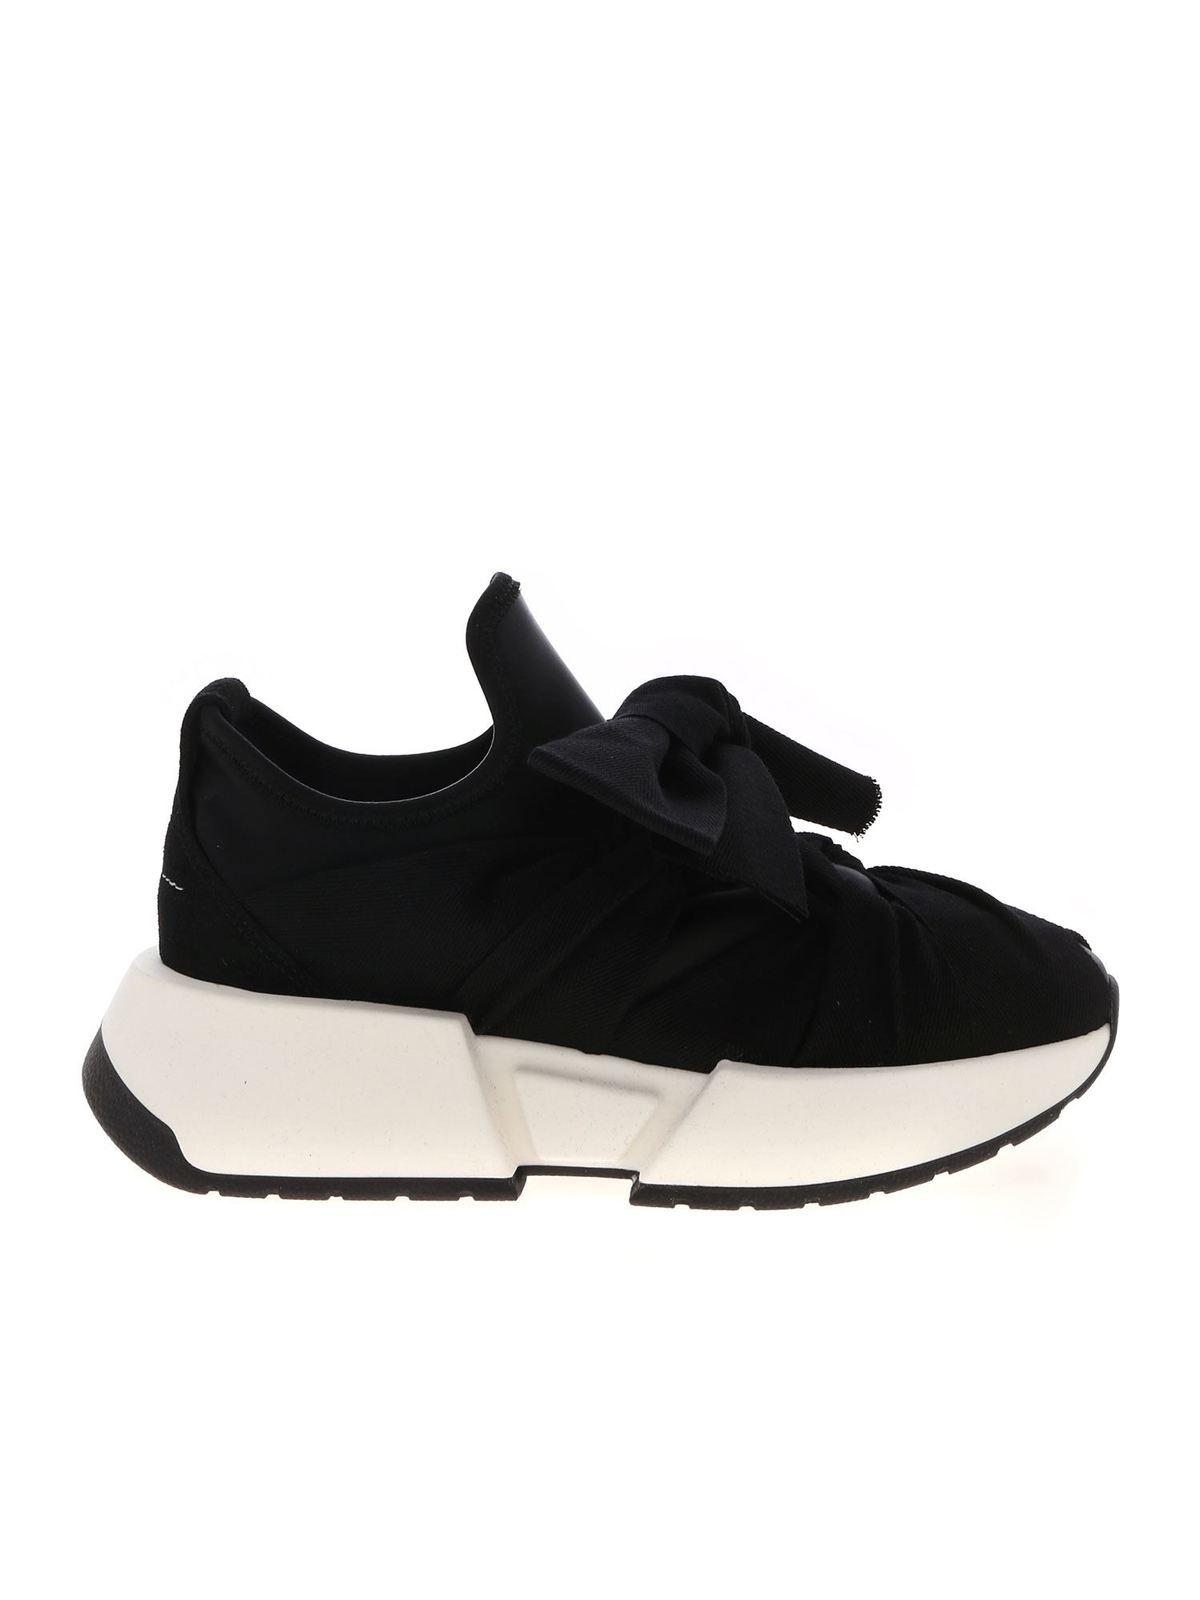 Mm6 Maison Margiela Sneakers BOW SNEAKERS IN BLACK